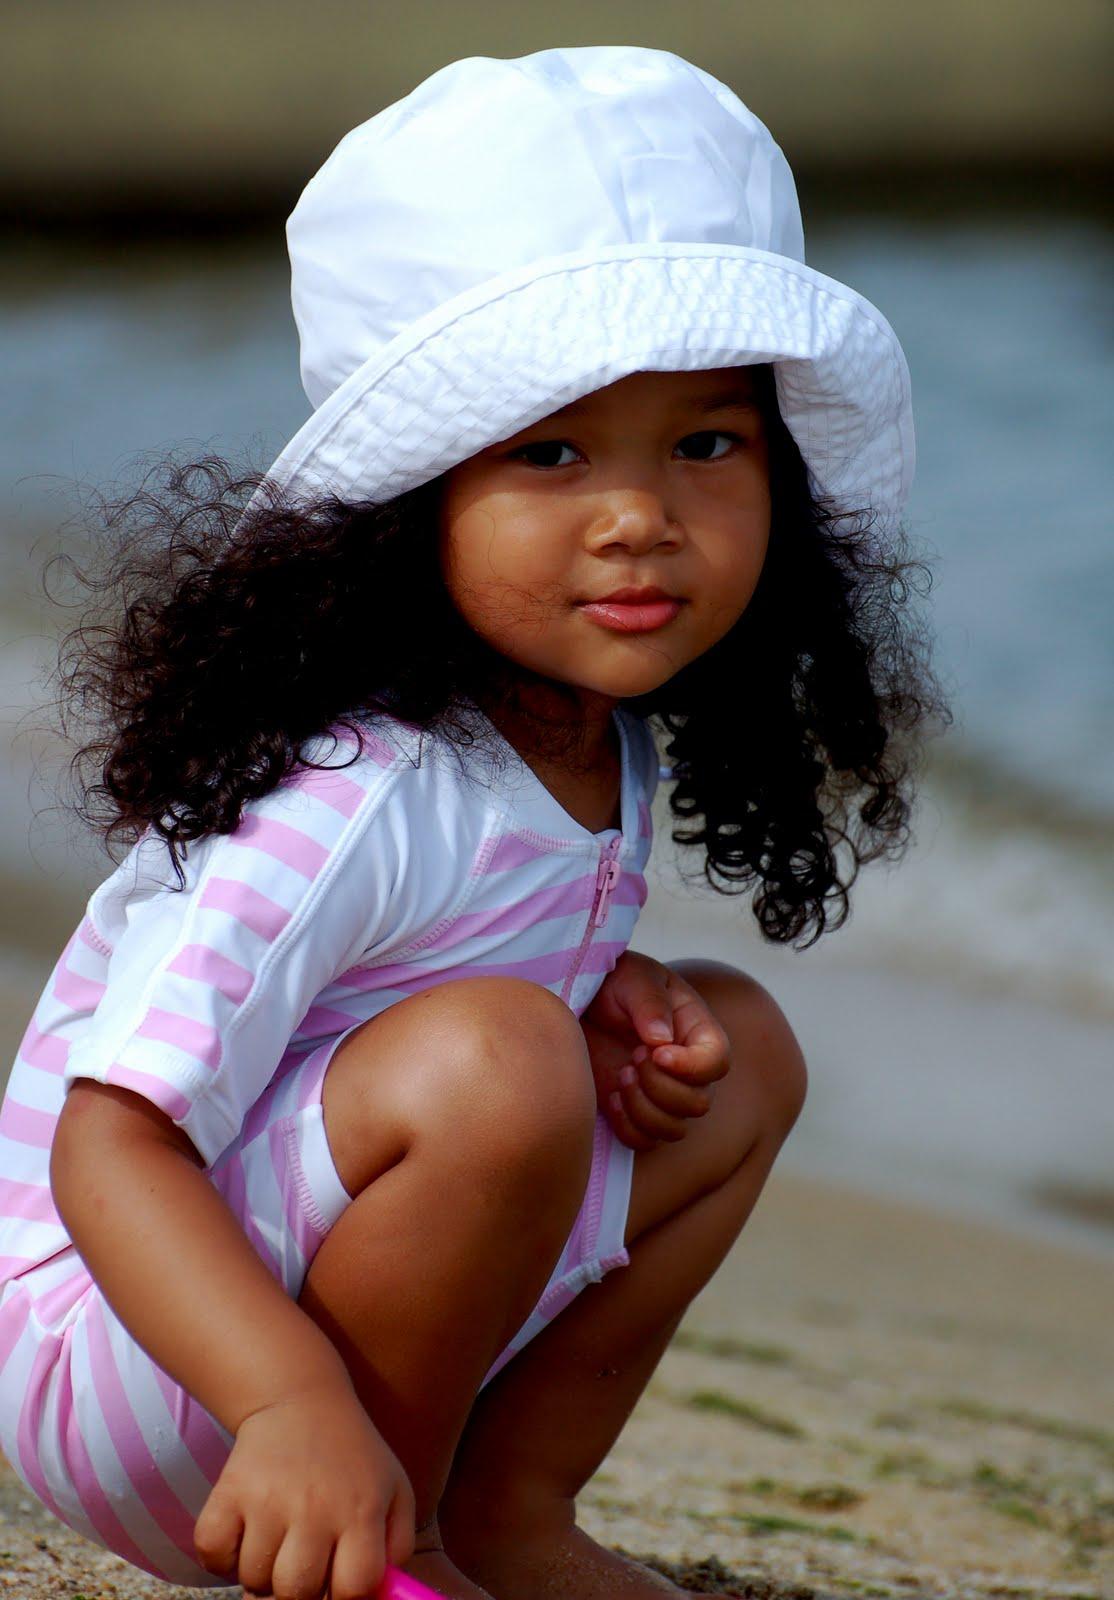 Zonnehoedjes voor meisjes. Leuke zonnehoeden bestel je online bij Stoerekindjes